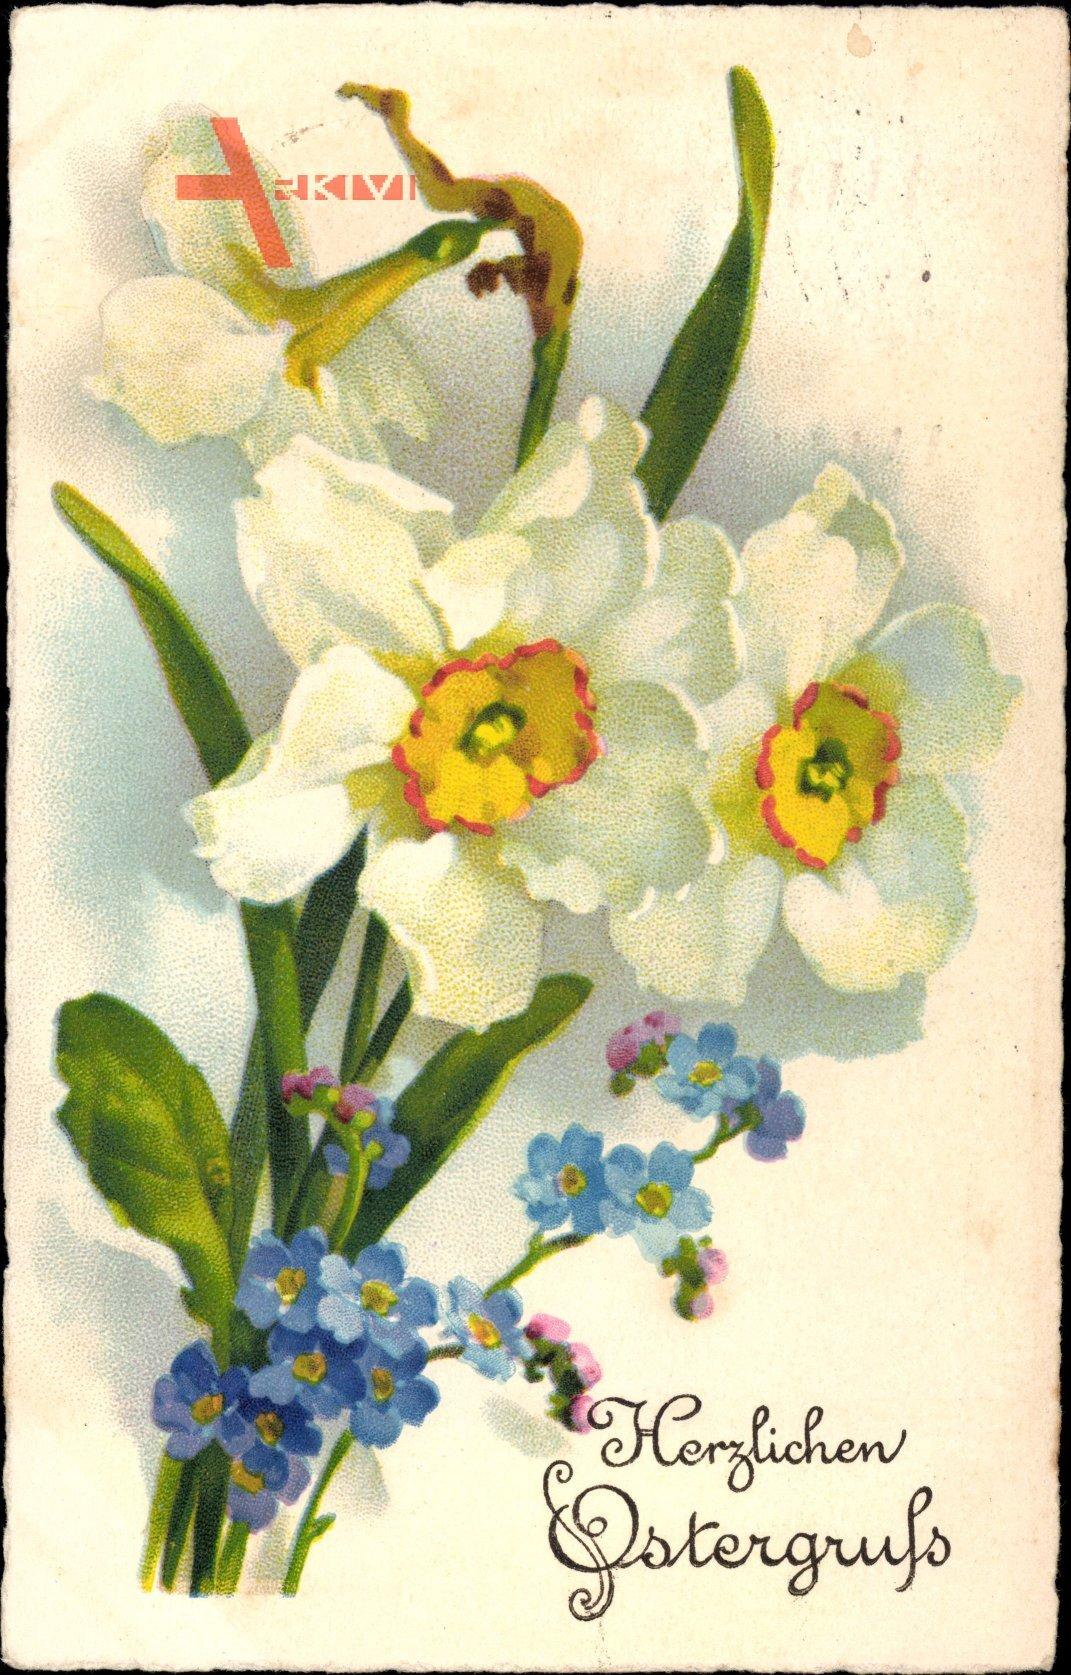 Glückwunsch Ostern, Osterglocken, Vergissmeinnicht, Narzisse, EAS 678